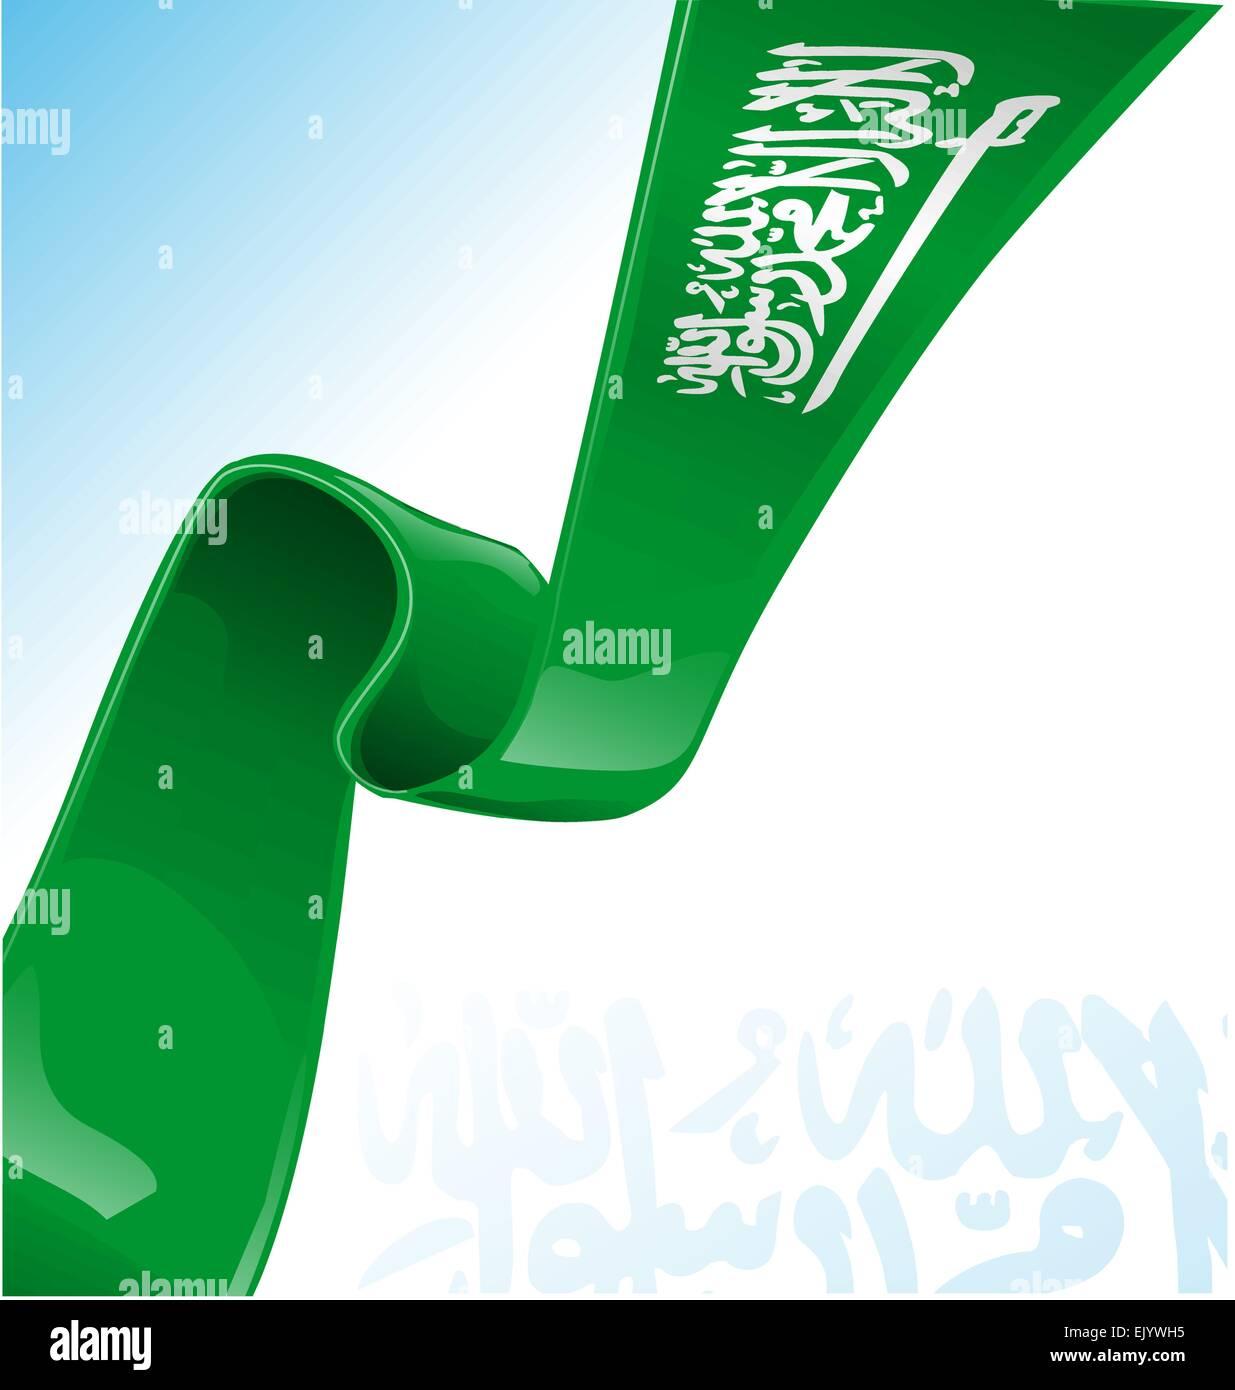 Saudi Arabia Flag On Background